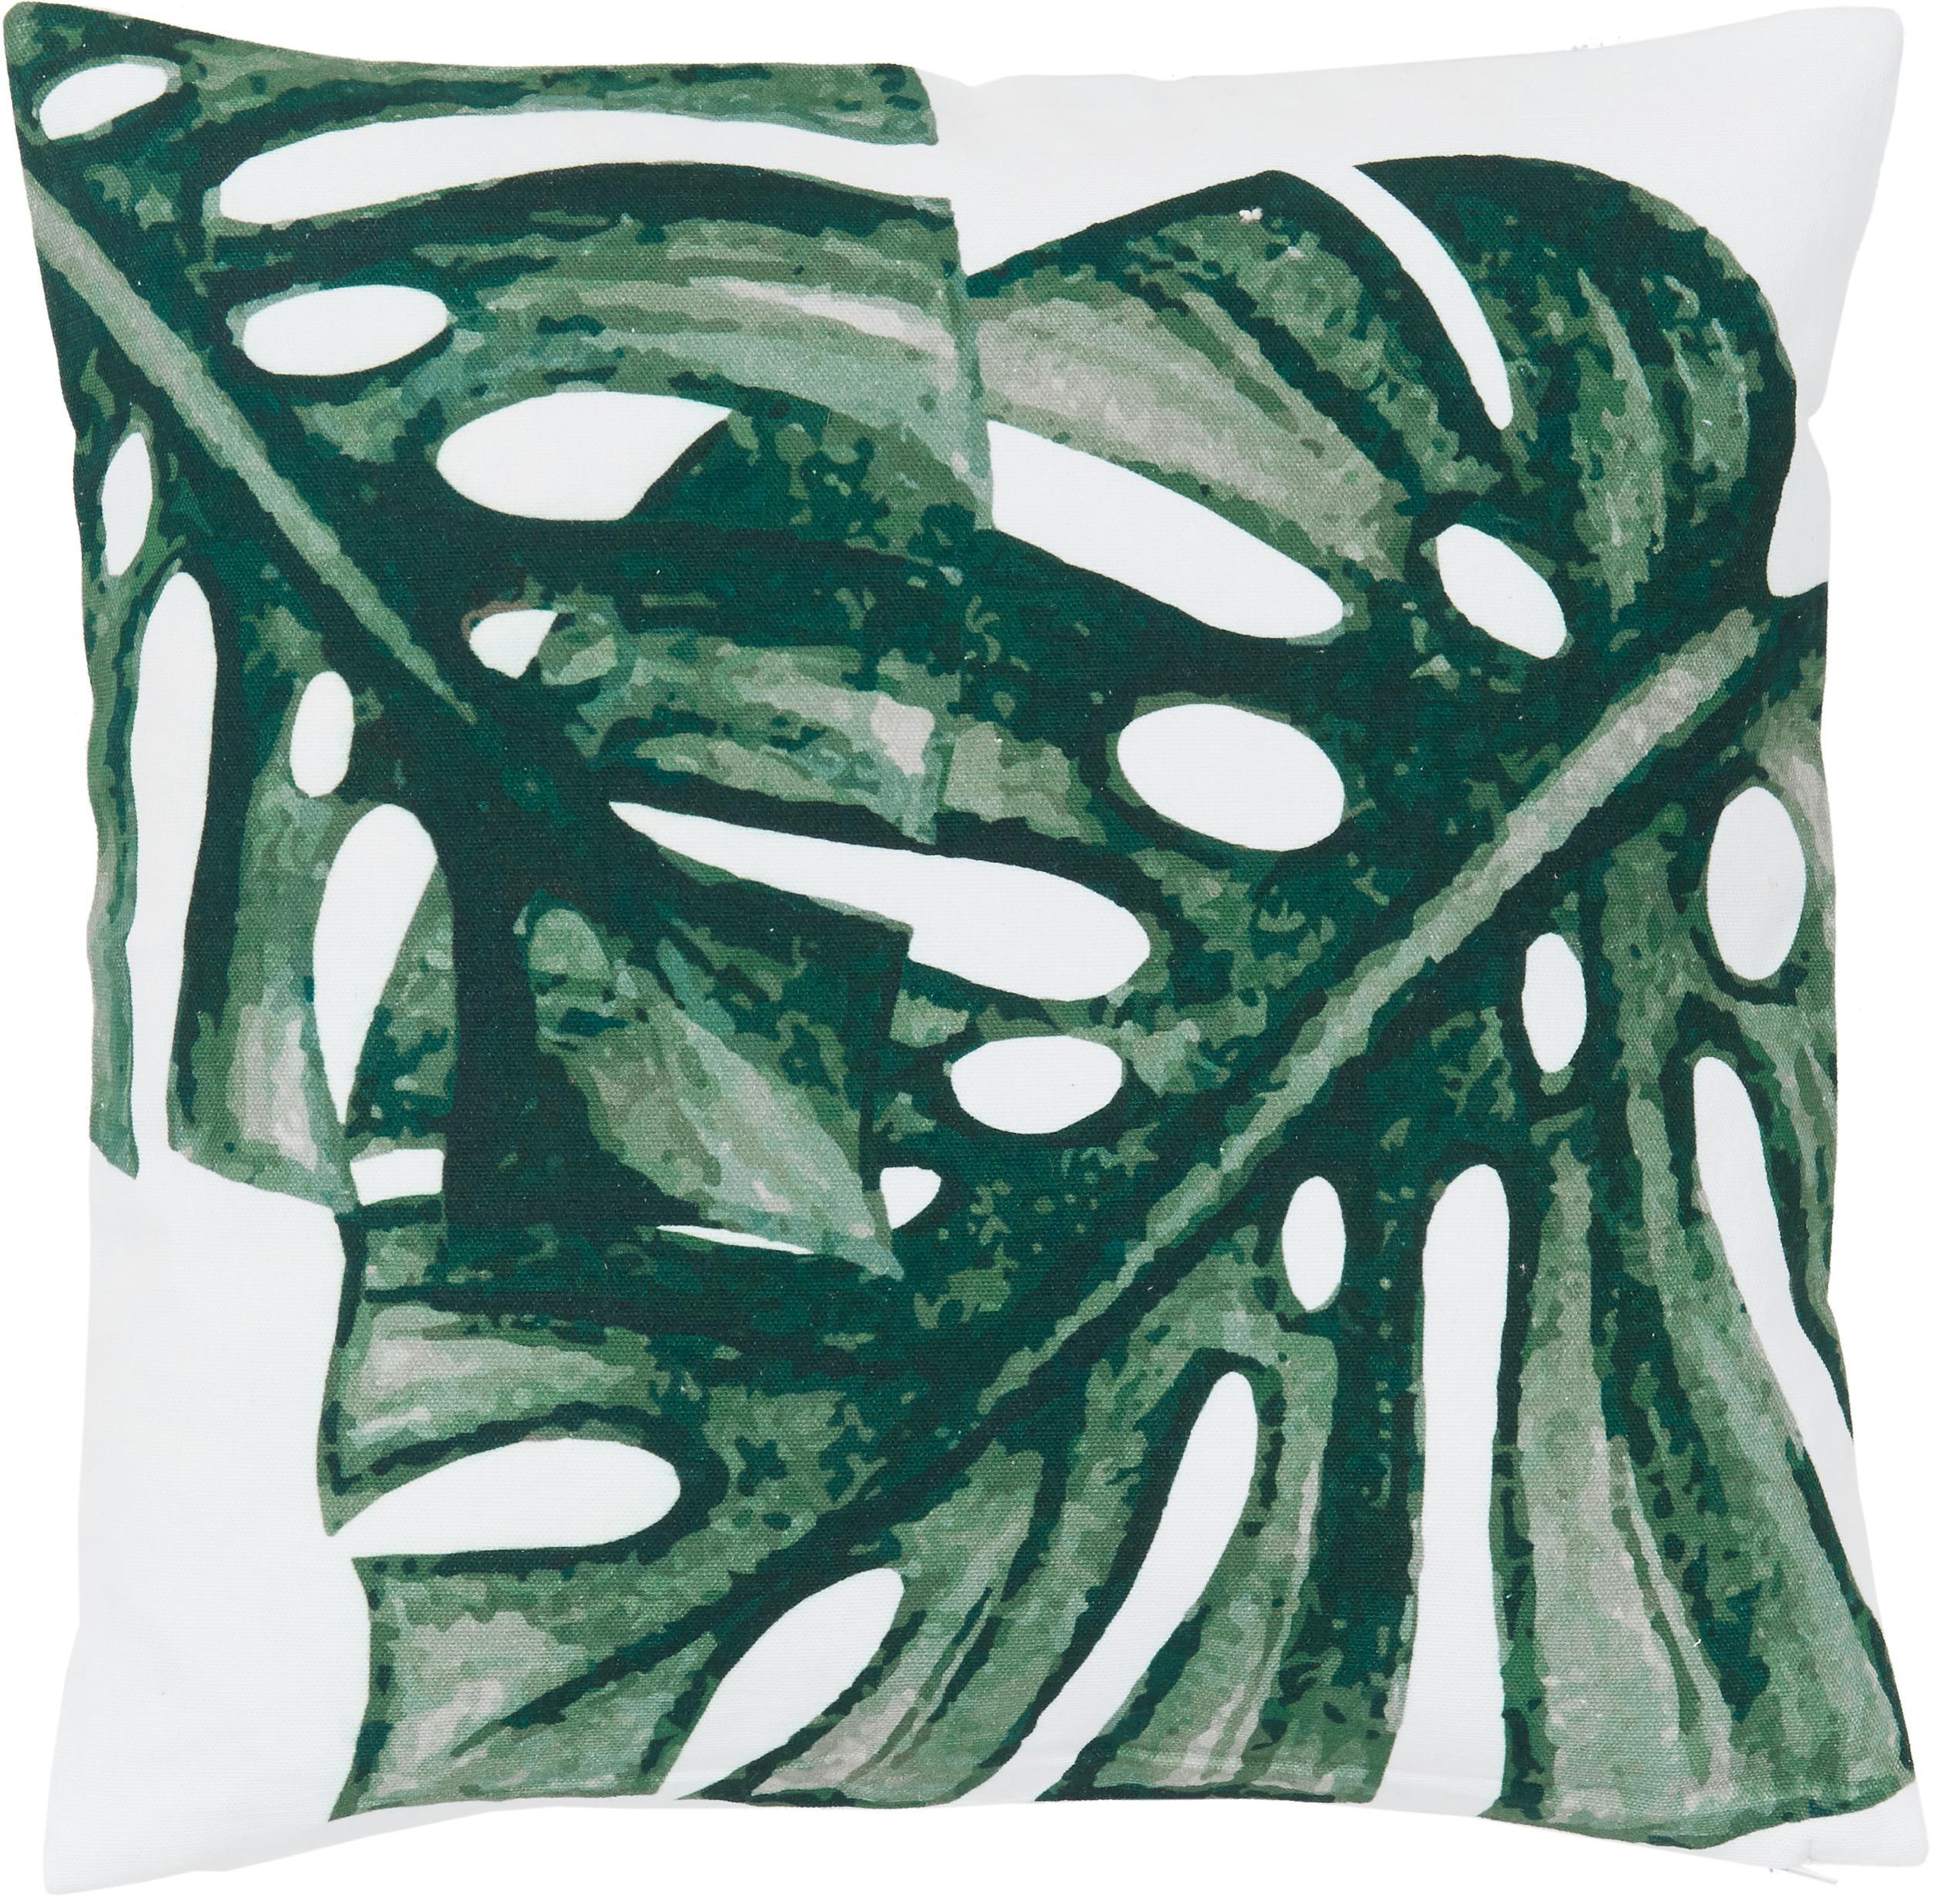 Kissenhülle Tropics mit Monstera Print in Grün/Weiß, 100% Baumwolle, Grün, Weiß, 40 x 40 cm